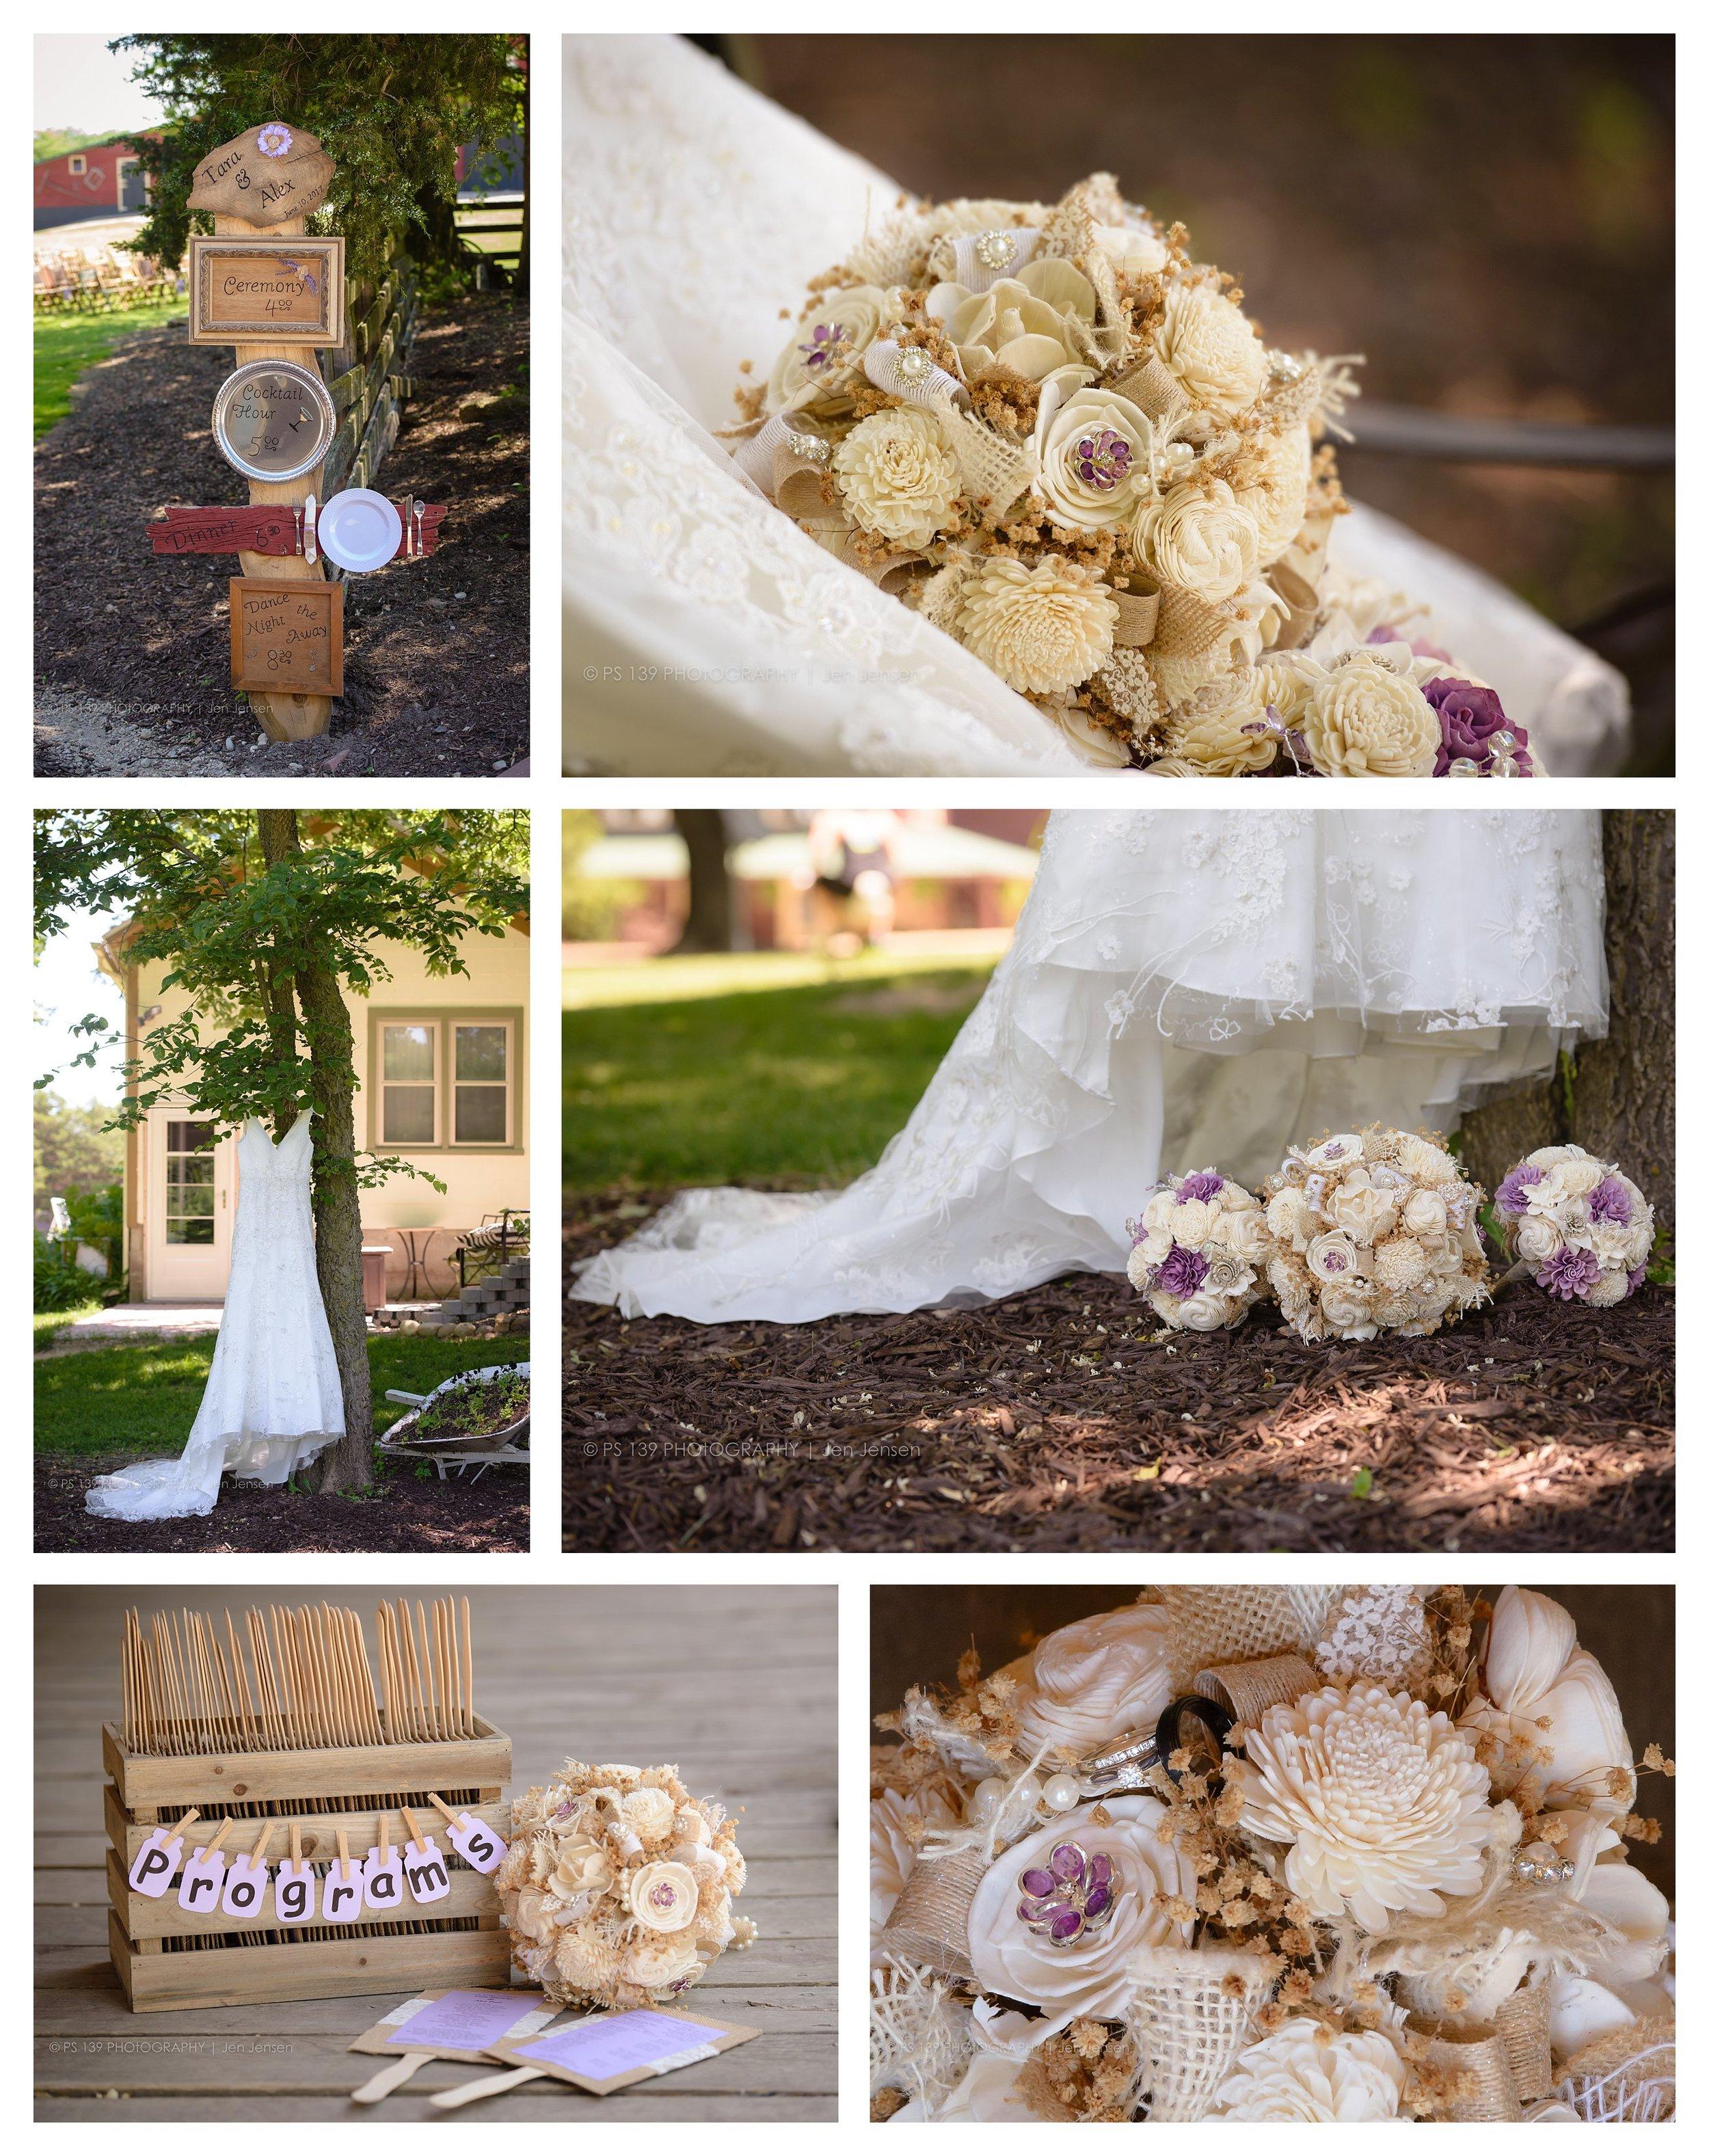 oregon Illinois oak lane farm wisconsin wedding photographer bayfield wi ps 139 photography jen jensen_0250.jpg